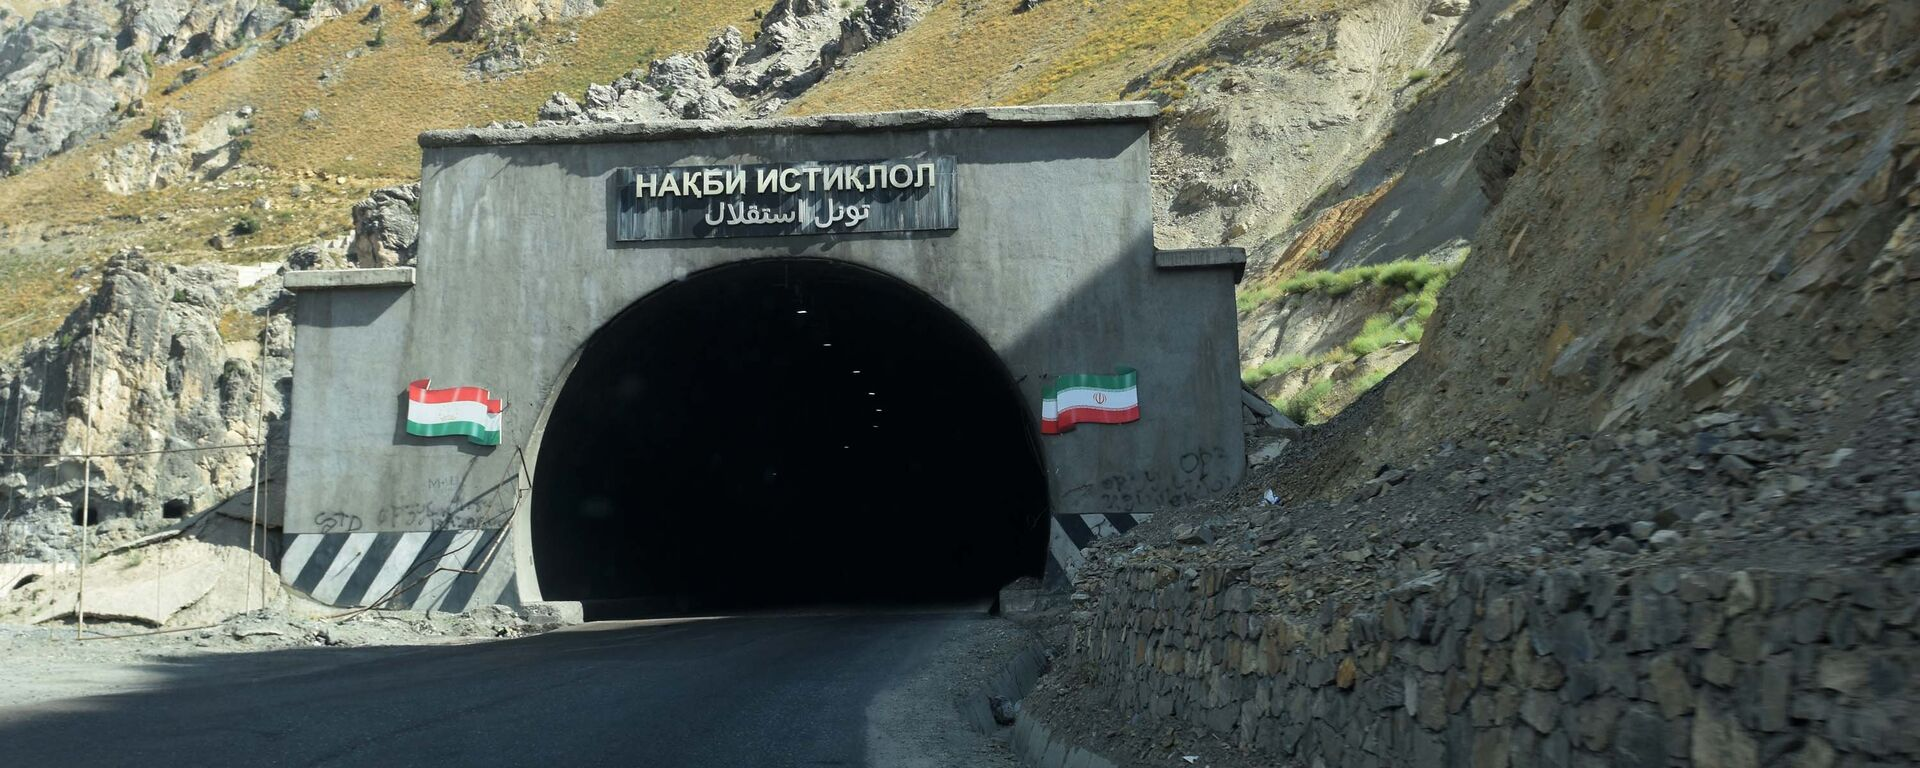 Тоннель Истиклол, архивное фото - Sputnik Таджикистан, 1920, 21.01.2021